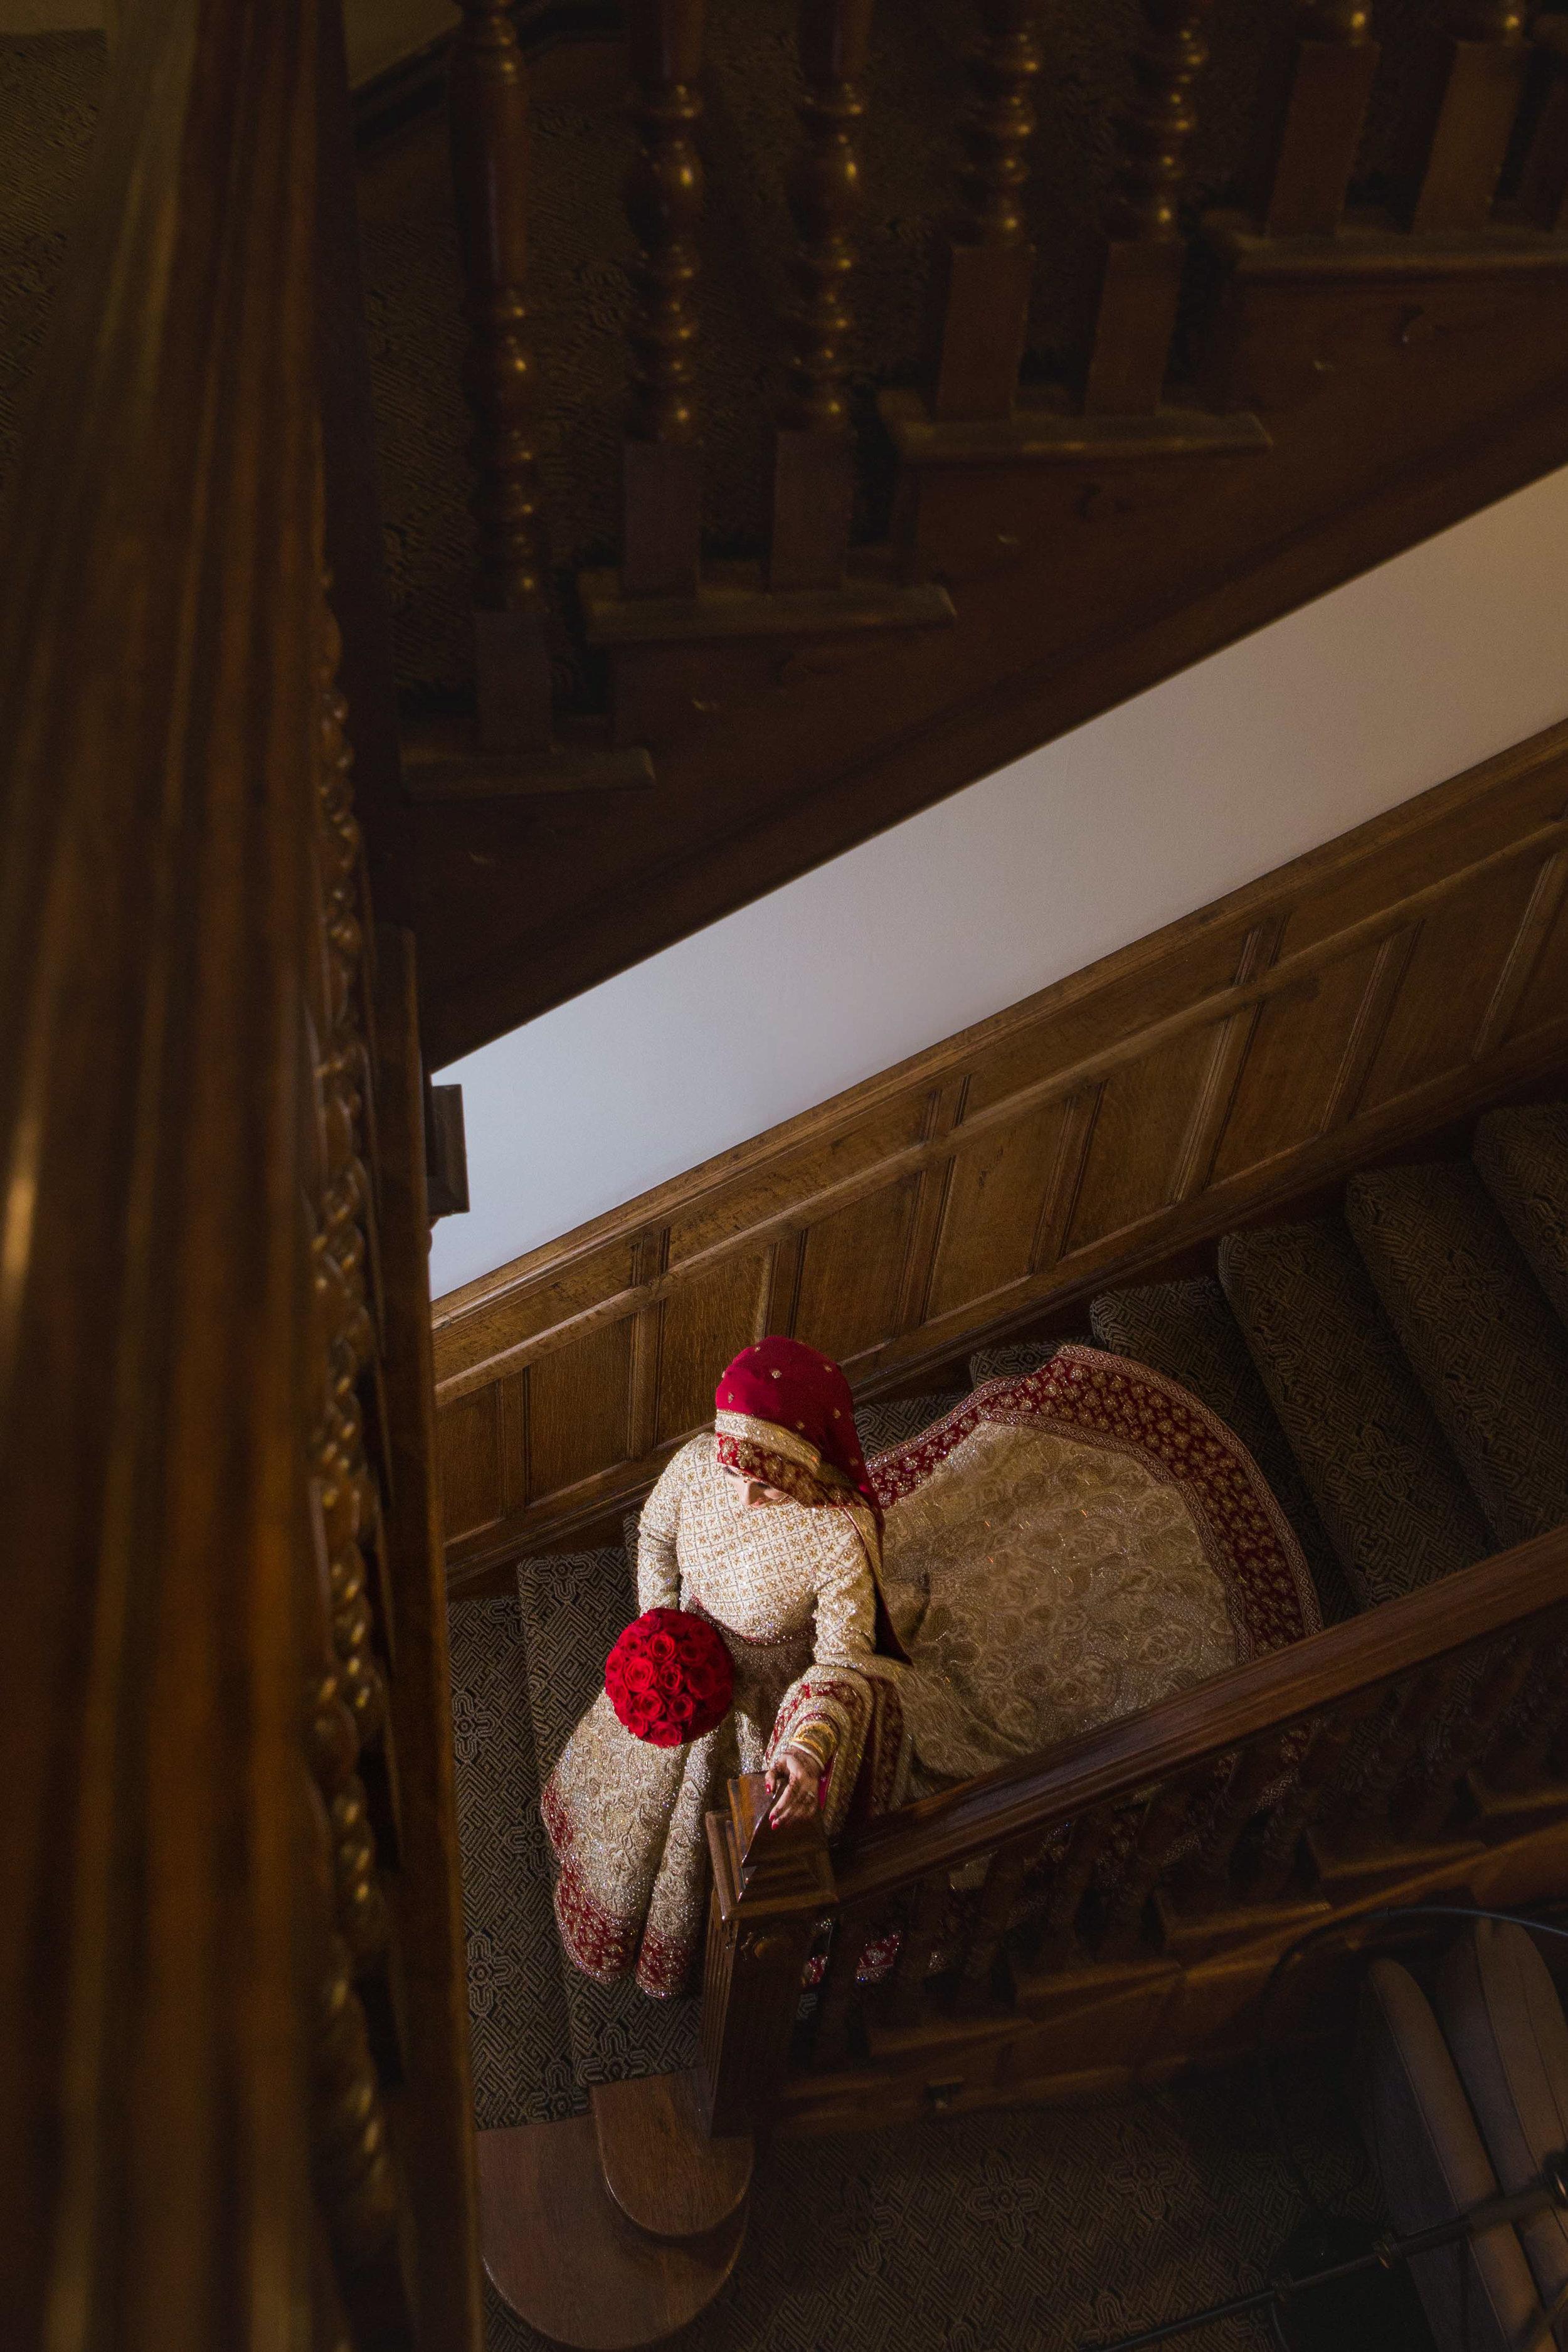 Macdonald-Berystede-Hotel-wedding-female-asian-wedding-photographer-london-natalia-smith-photography-23-2.jpg